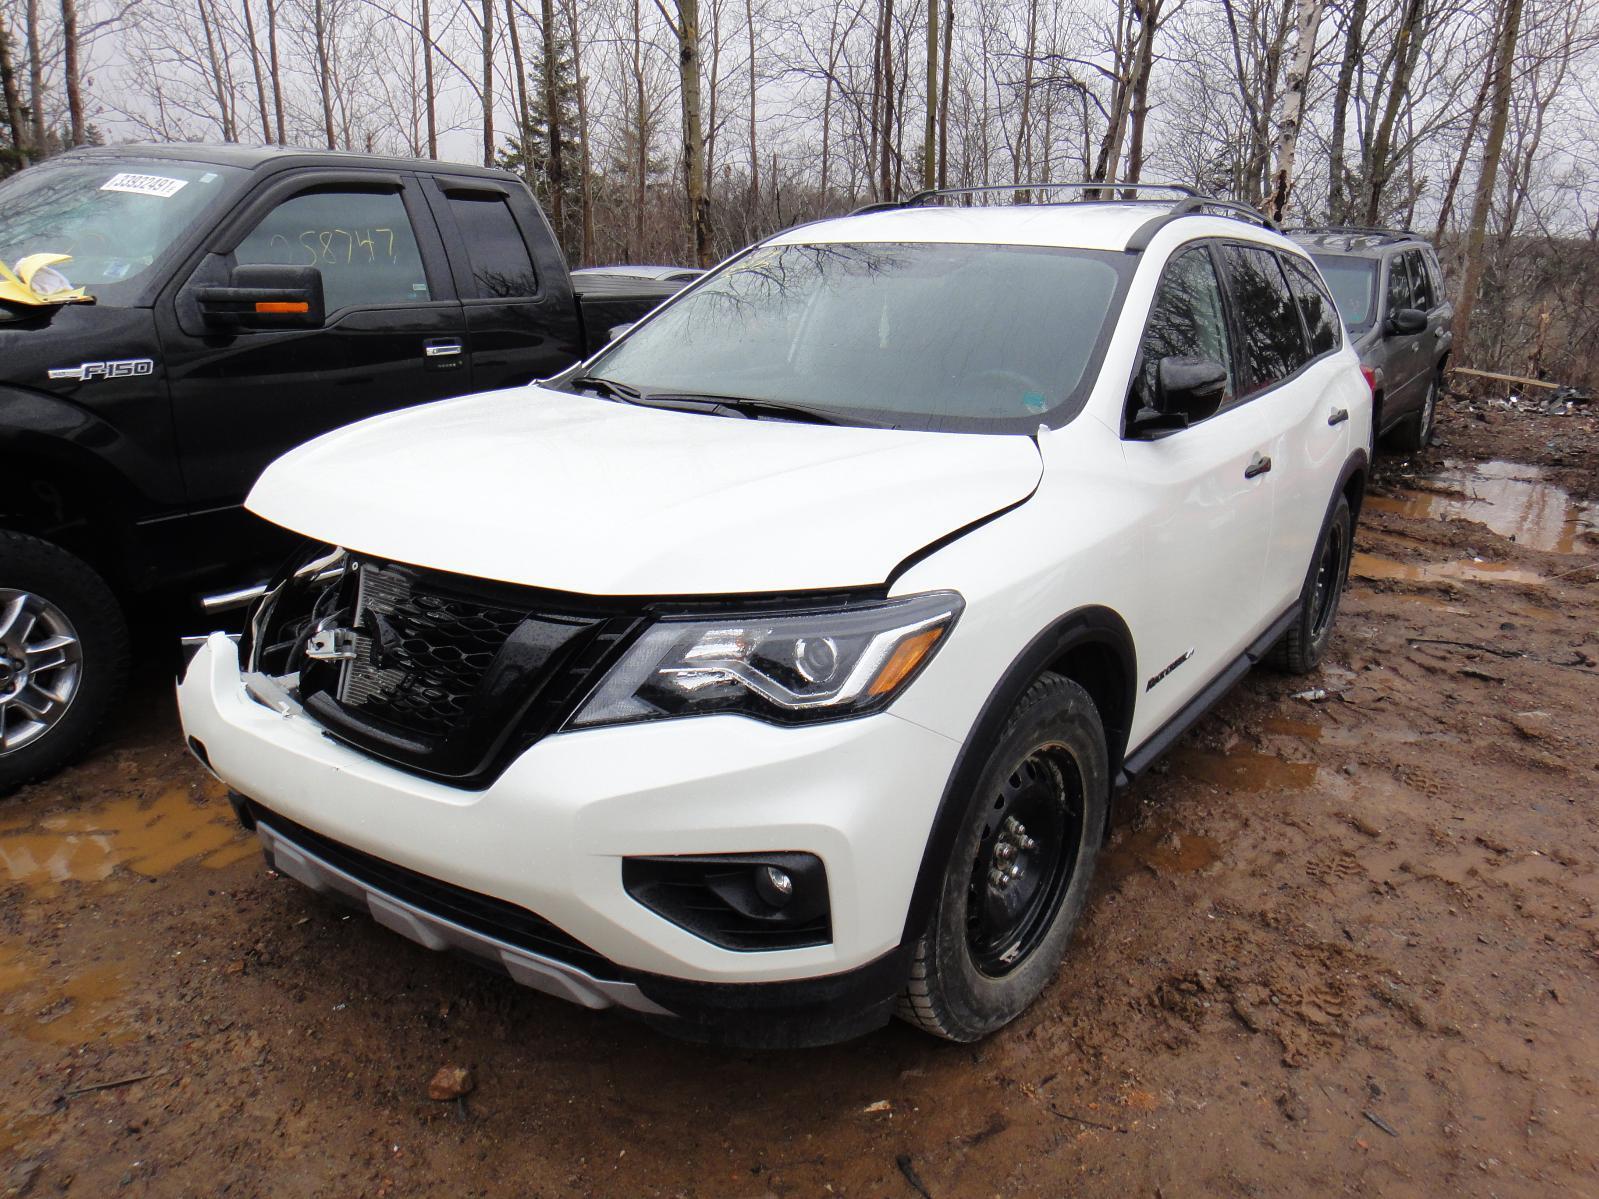 2019 Nissan Pathfinder SV 4WD Rock Creek